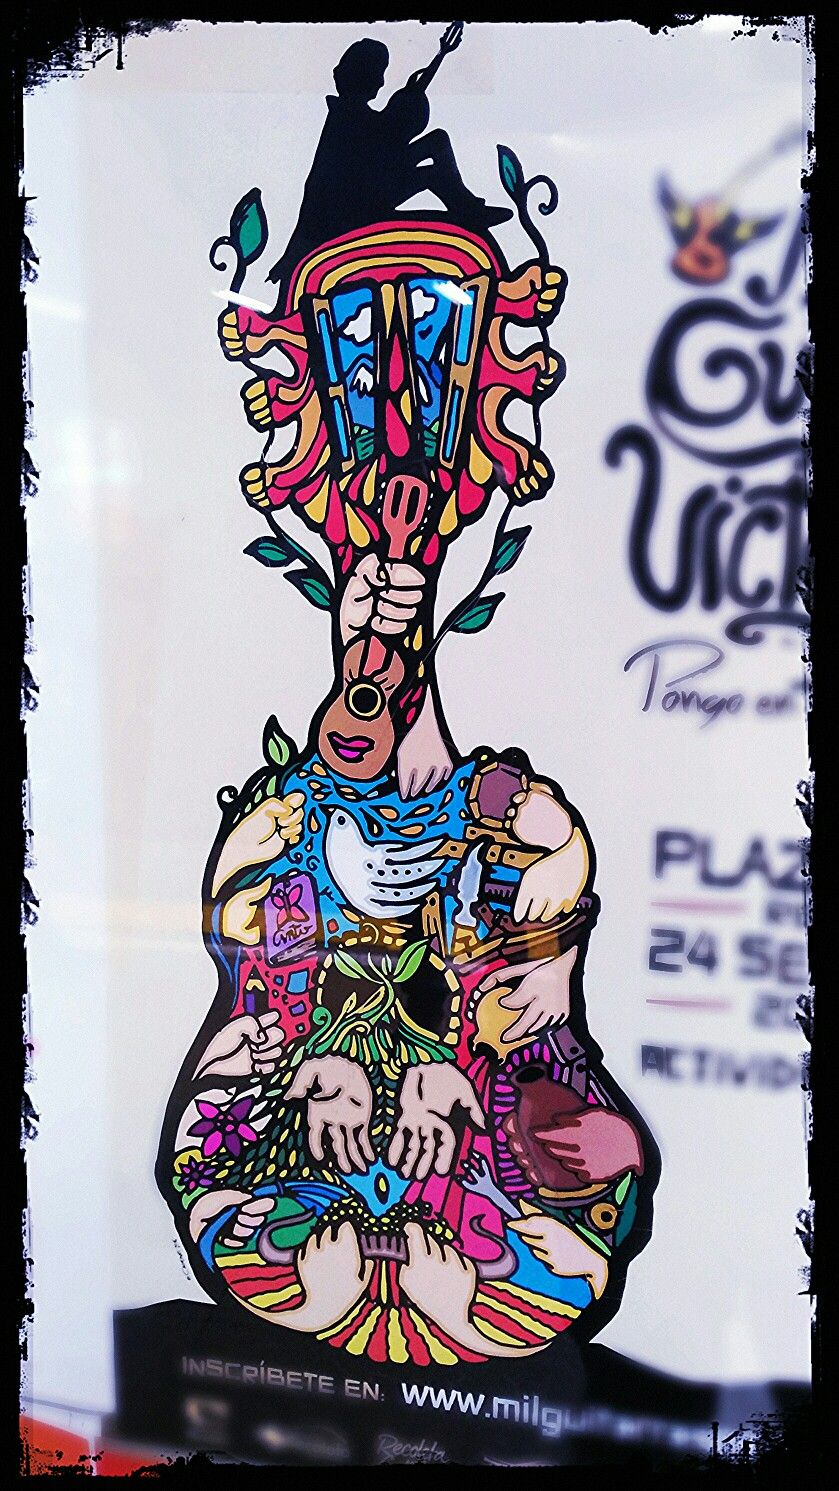 Gráfica Chilena La Mejor Murales Arte Latinoamericano Arte De Protesta